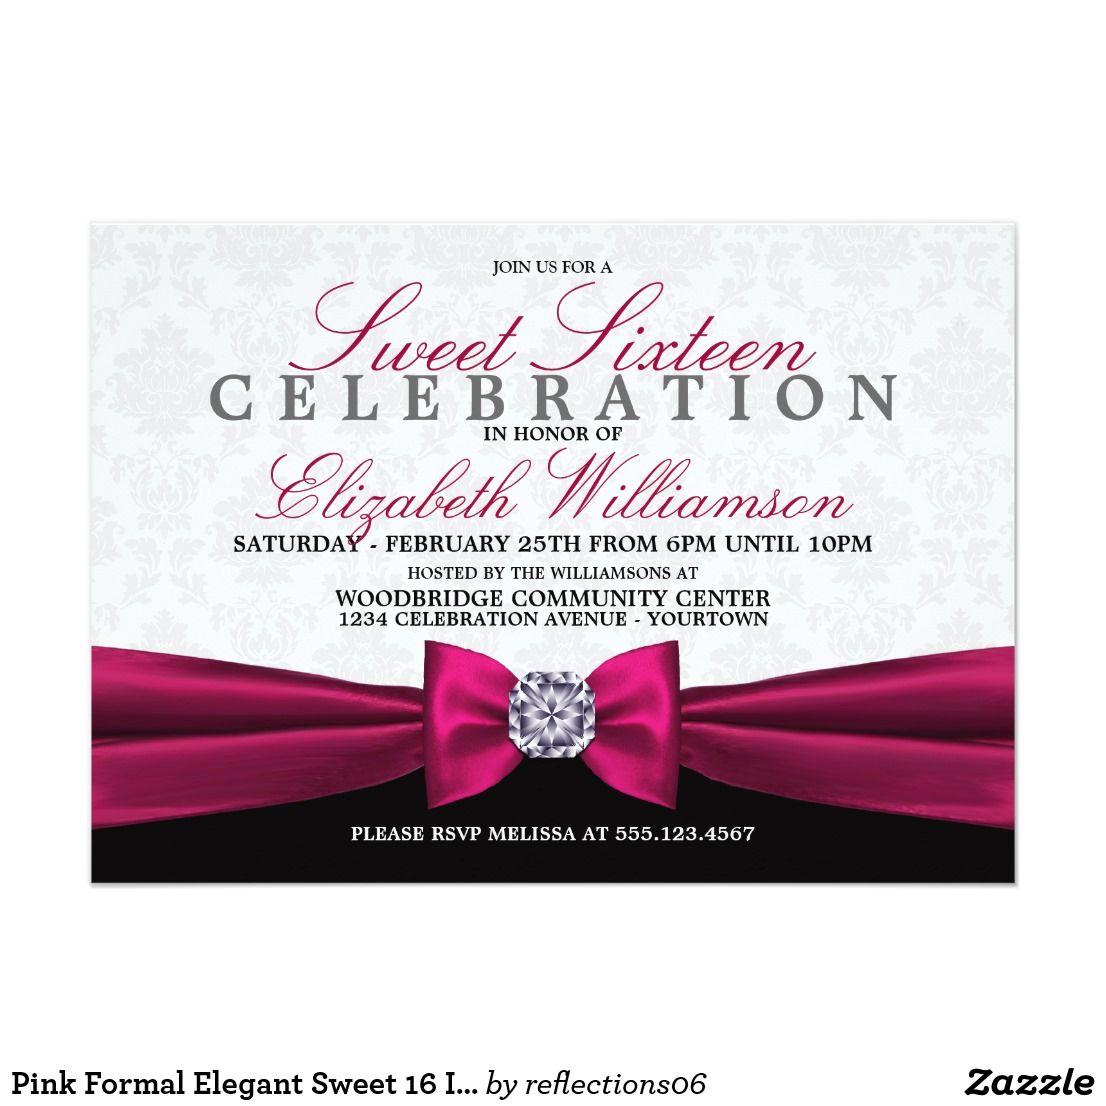 Pink Formal Elegant Sweet 16 Invitation Zazzle Com In 2019